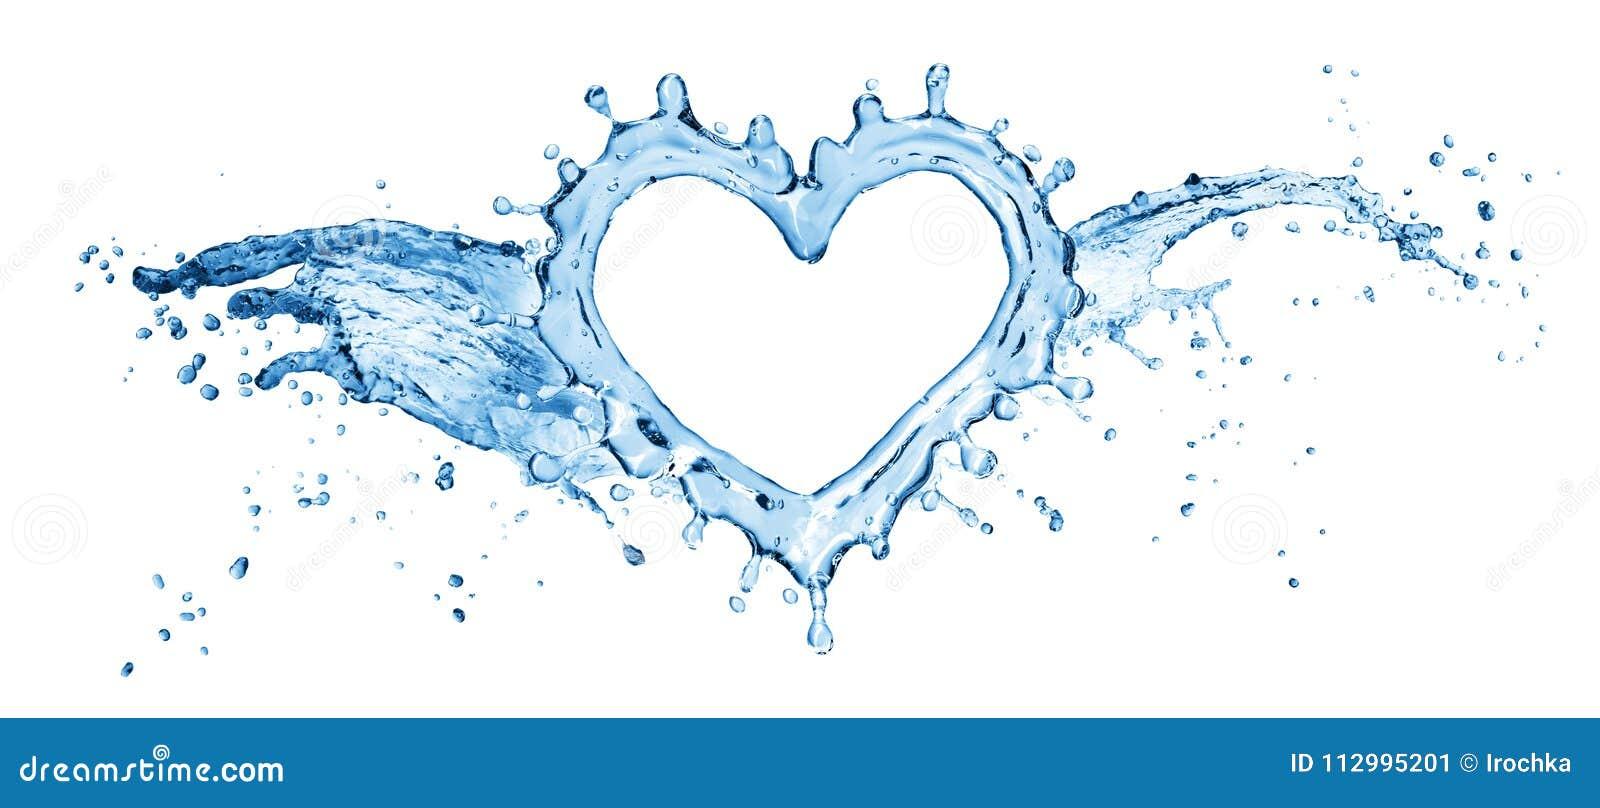 White water splashin